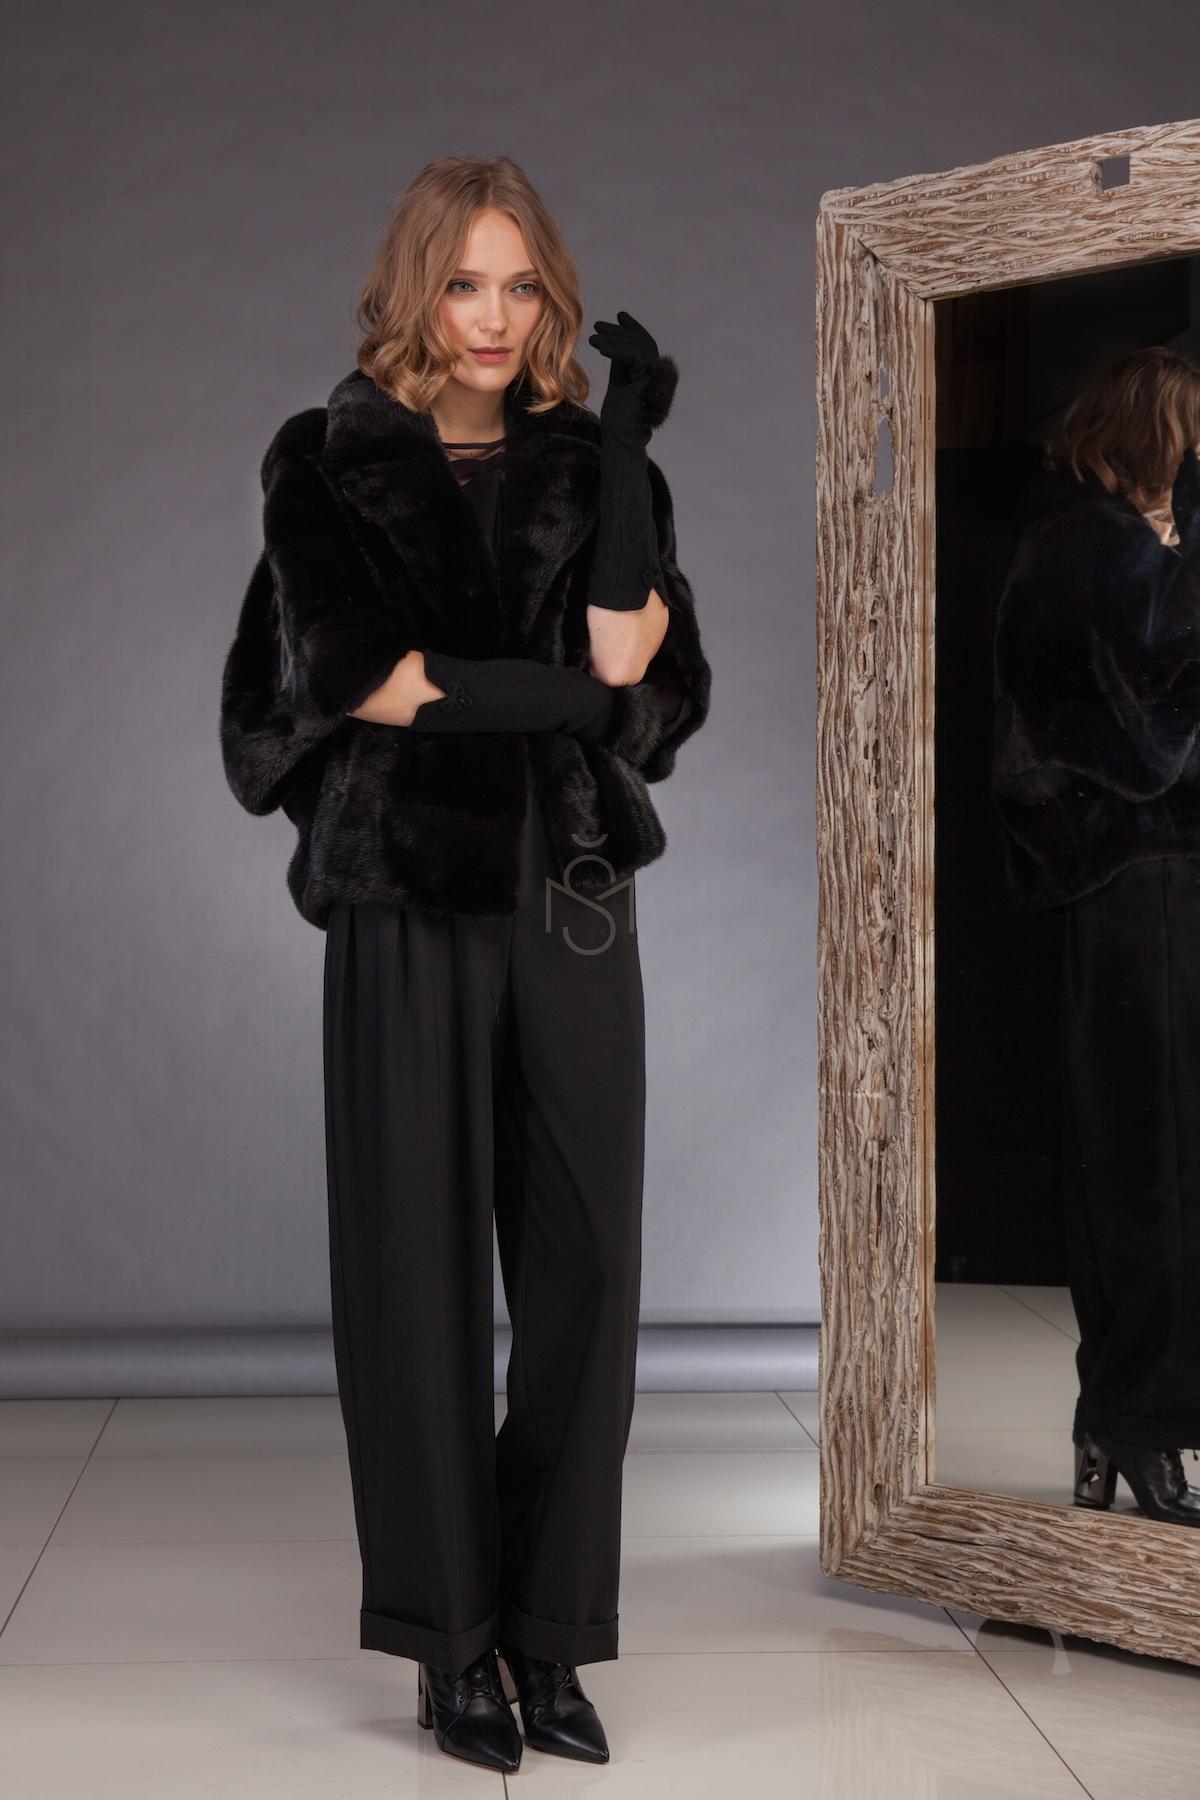 Mink fur coat_short_made by SILTA MADA fur studio in Vilnius